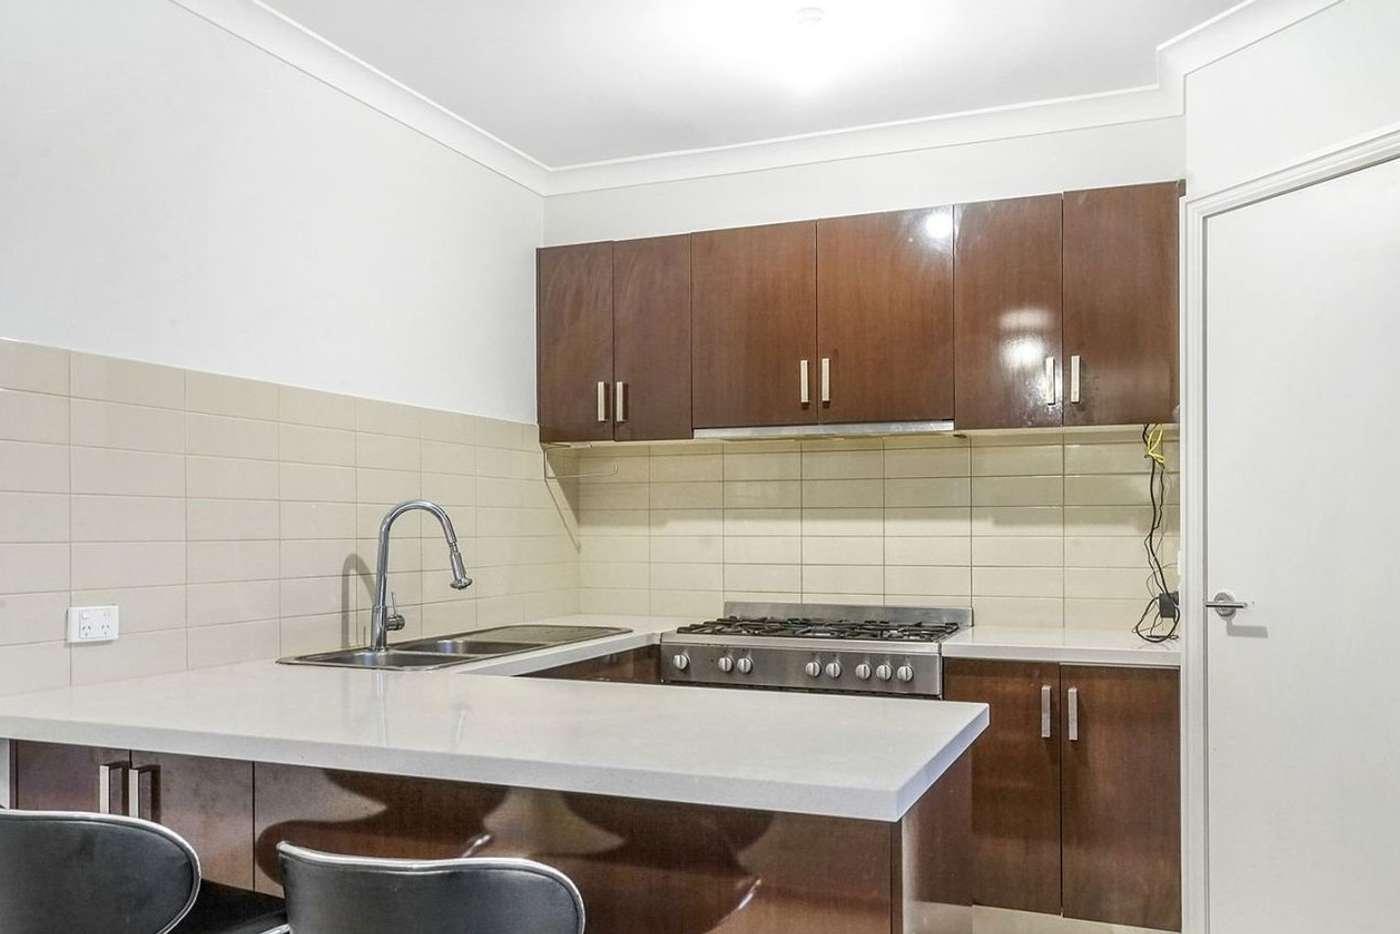 Sixth view of Homely house listing, 1 Mala Street, Truganina VIC 3029